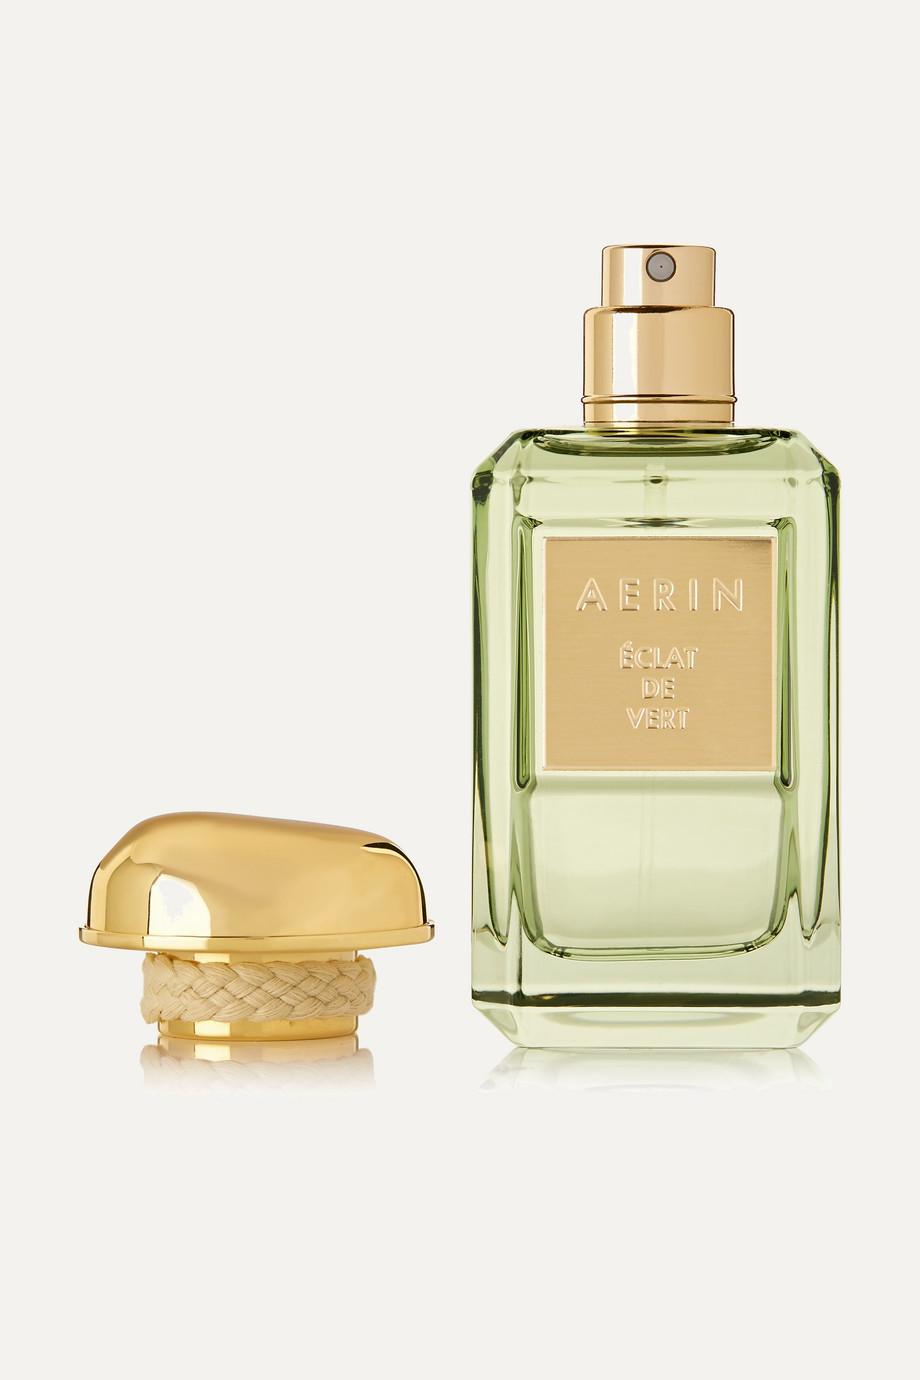 AERIN Beauty Éclat de Vert, 50 ml – Eau de Parfum